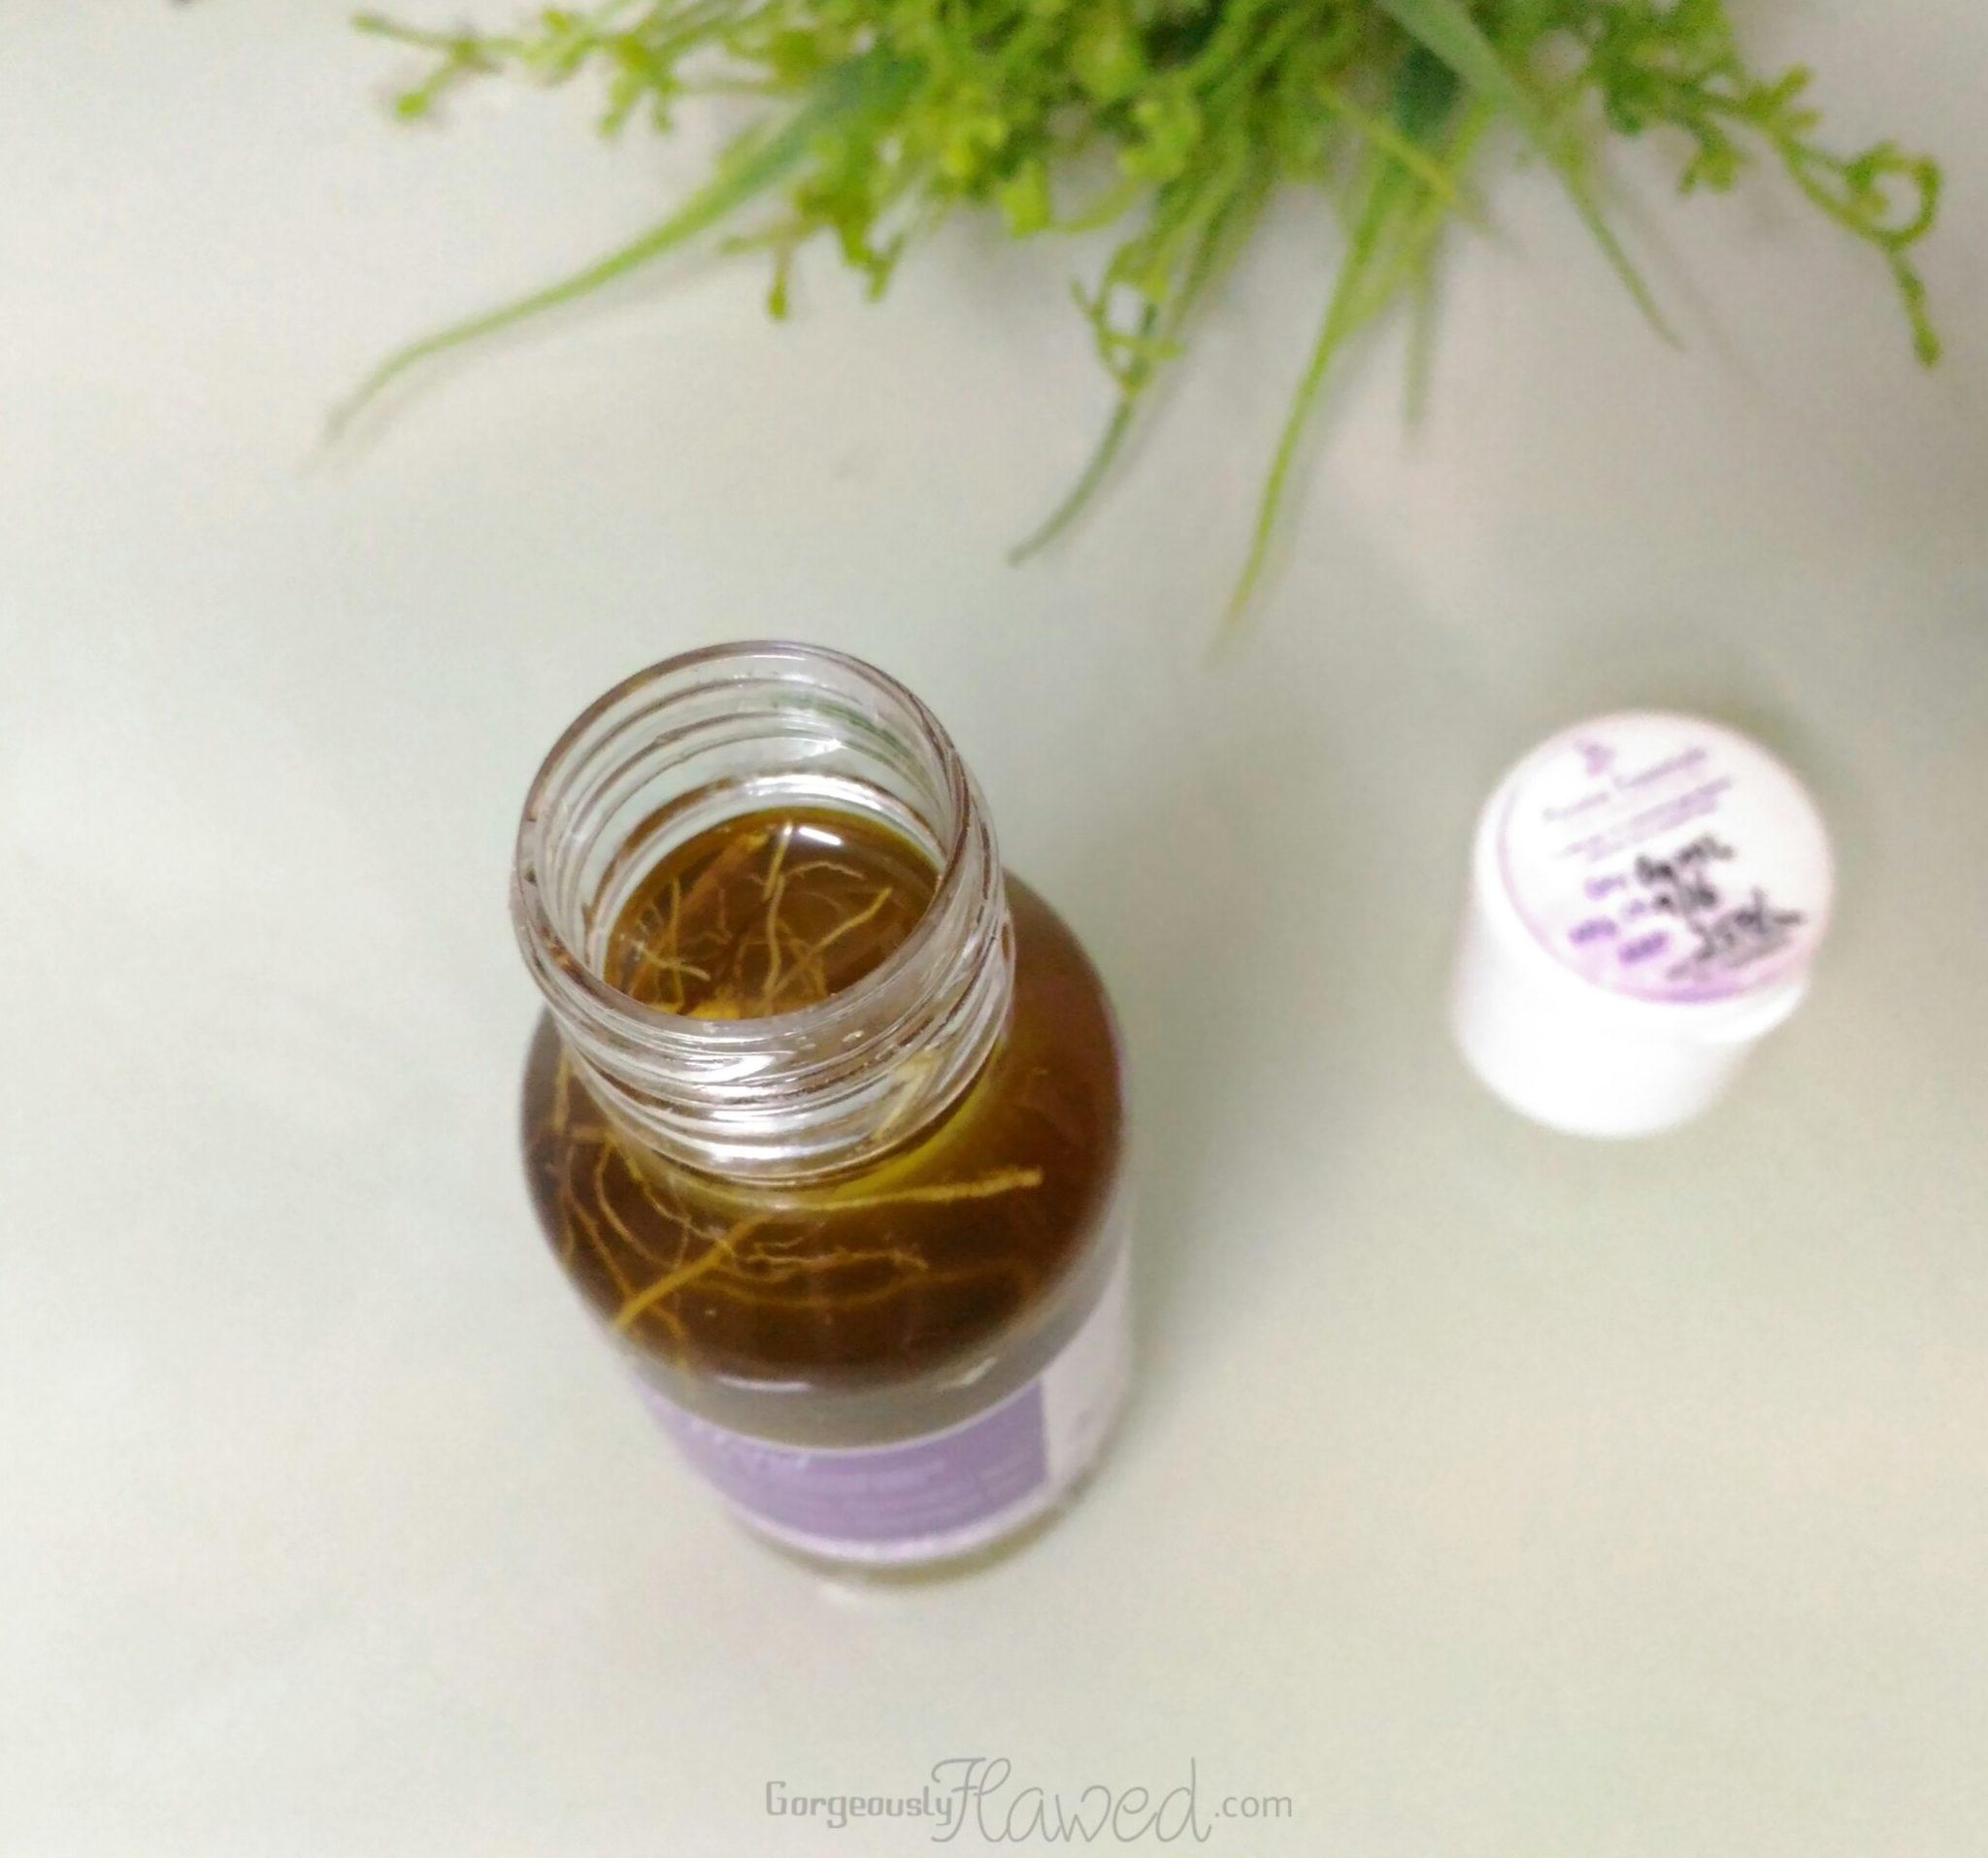 Aroma Essentials Hair Growth Blend